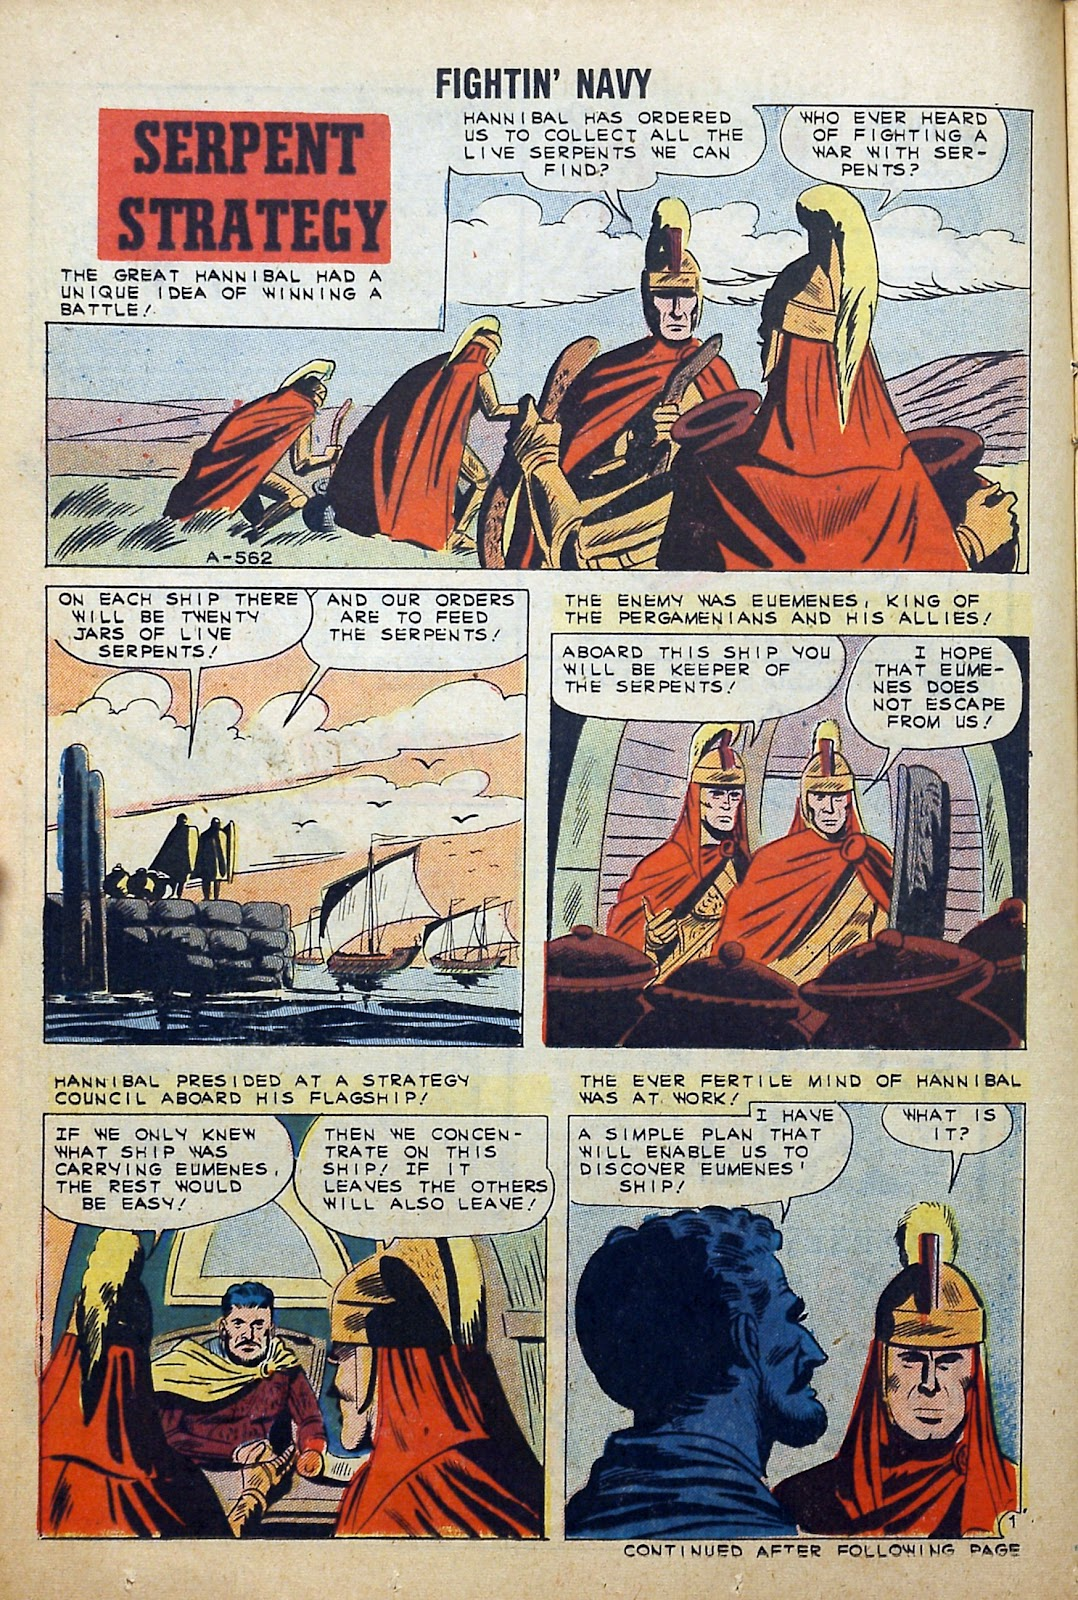 Read online Fightin' Navy comic -  Issue #99 - 14